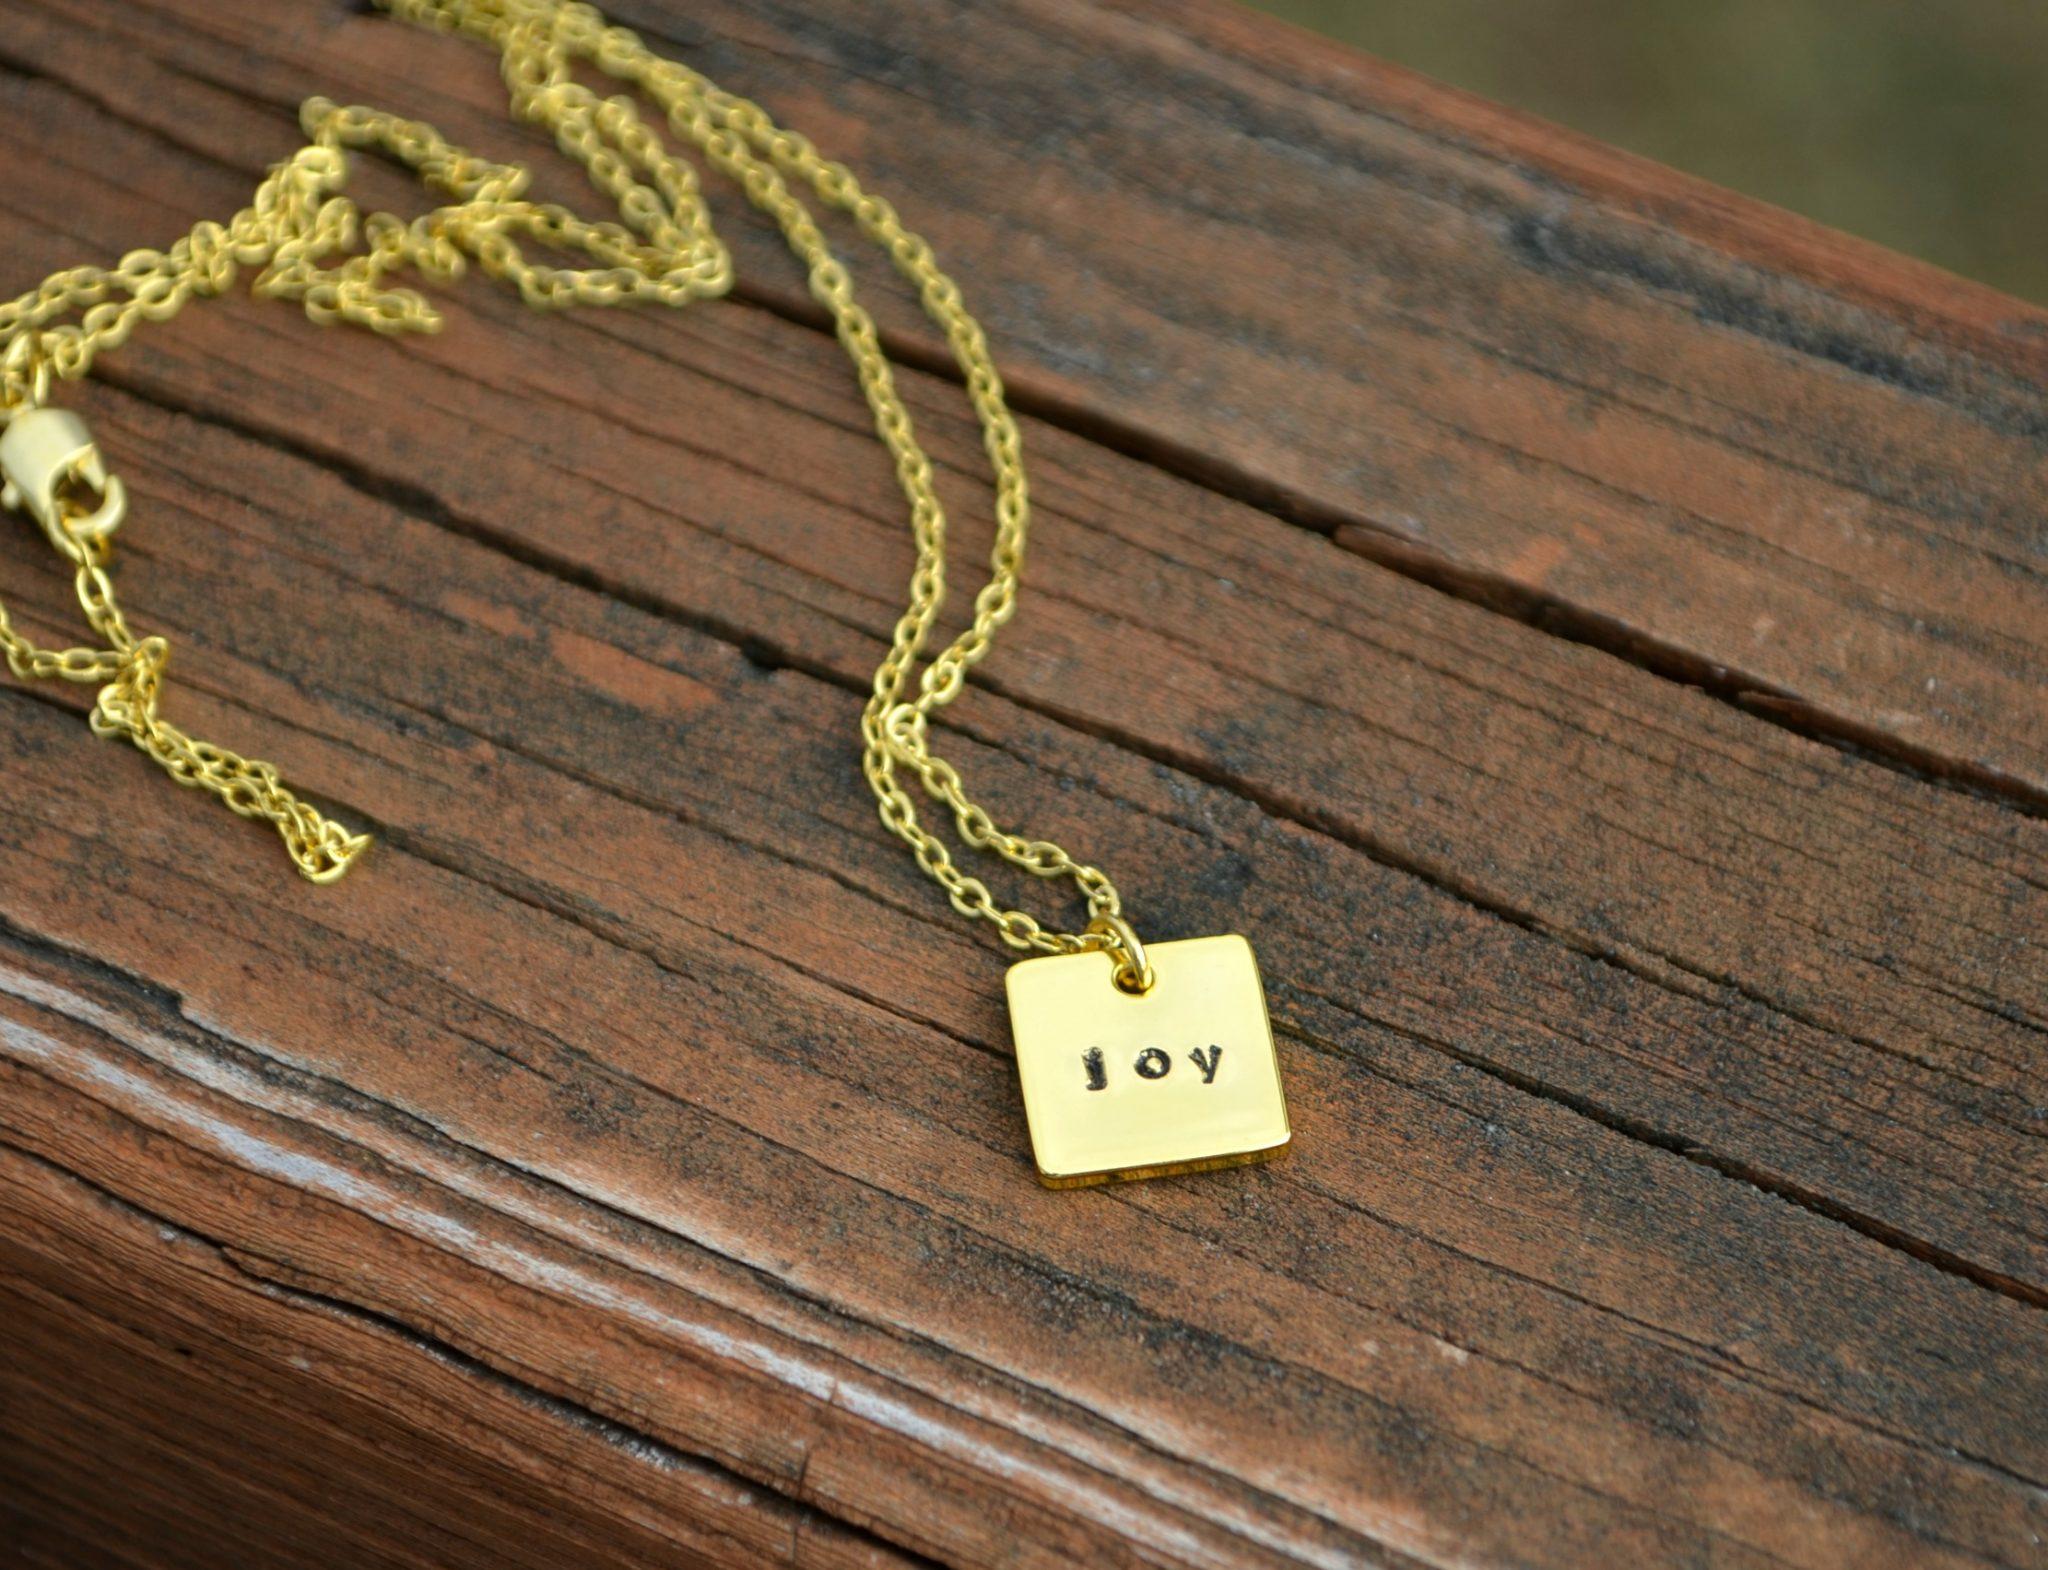 Stamped Joy Pendant